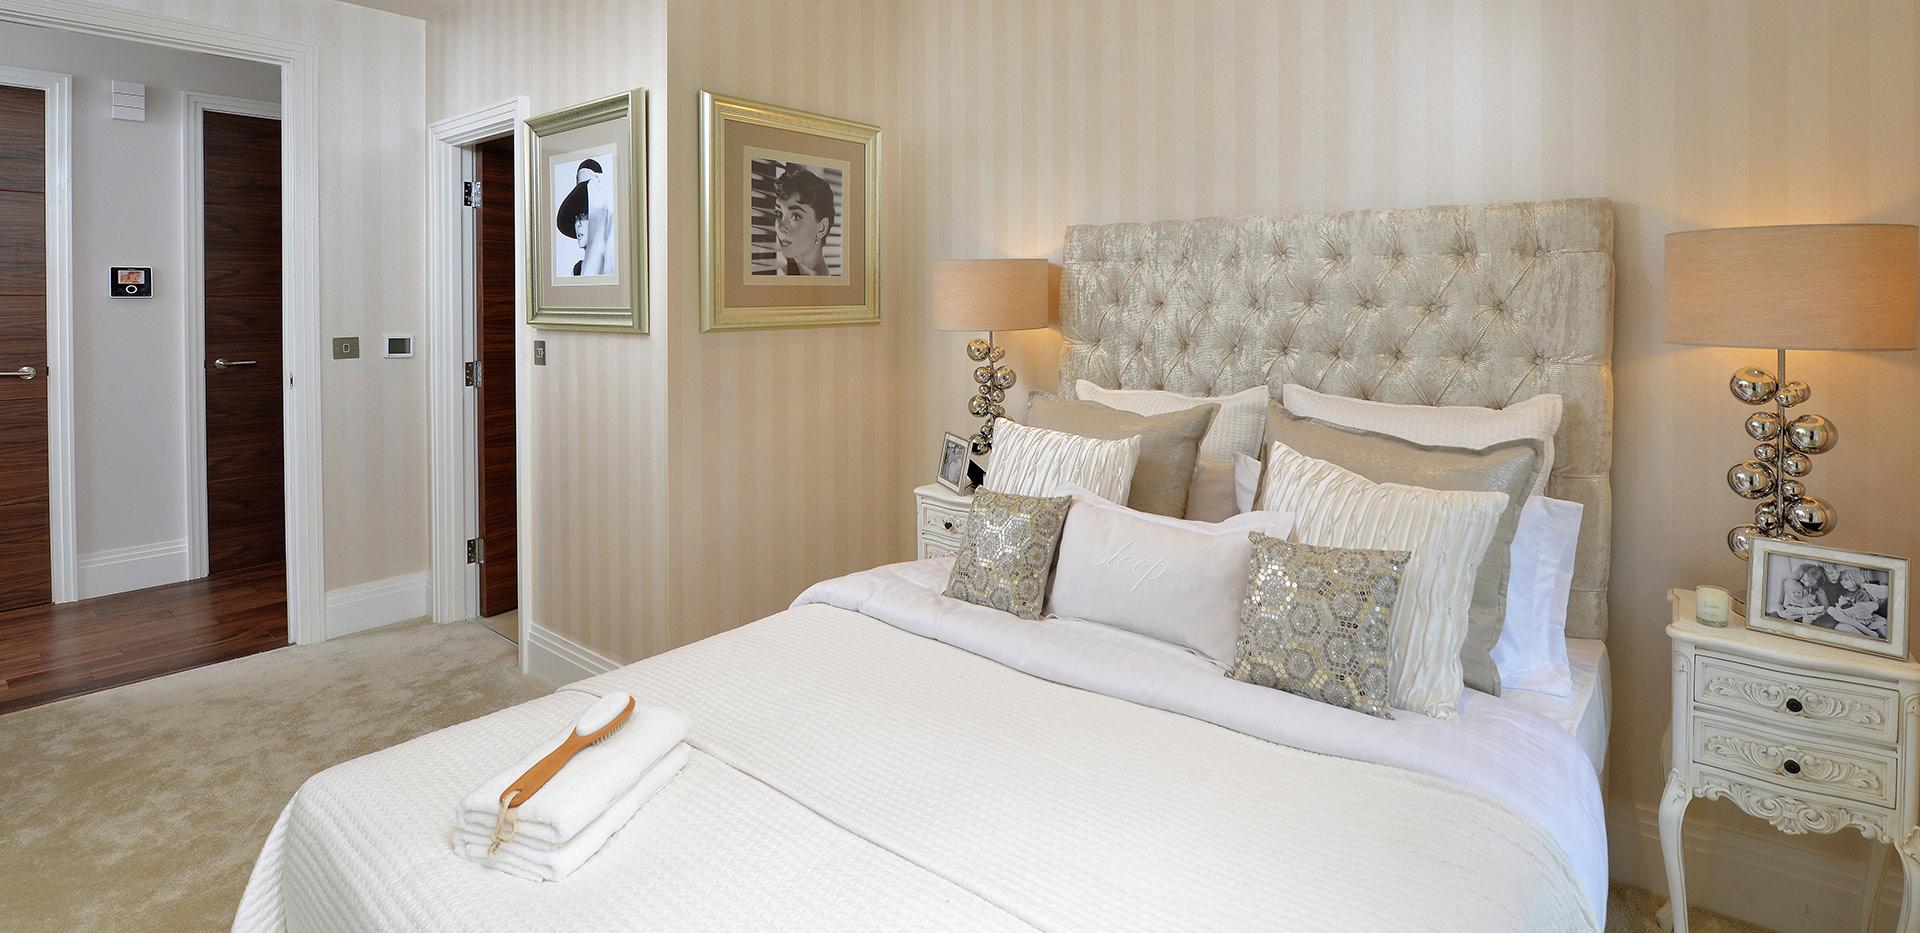 Berkeley, St Josephs Gate, Show Apartment, Guest Suite, Interior